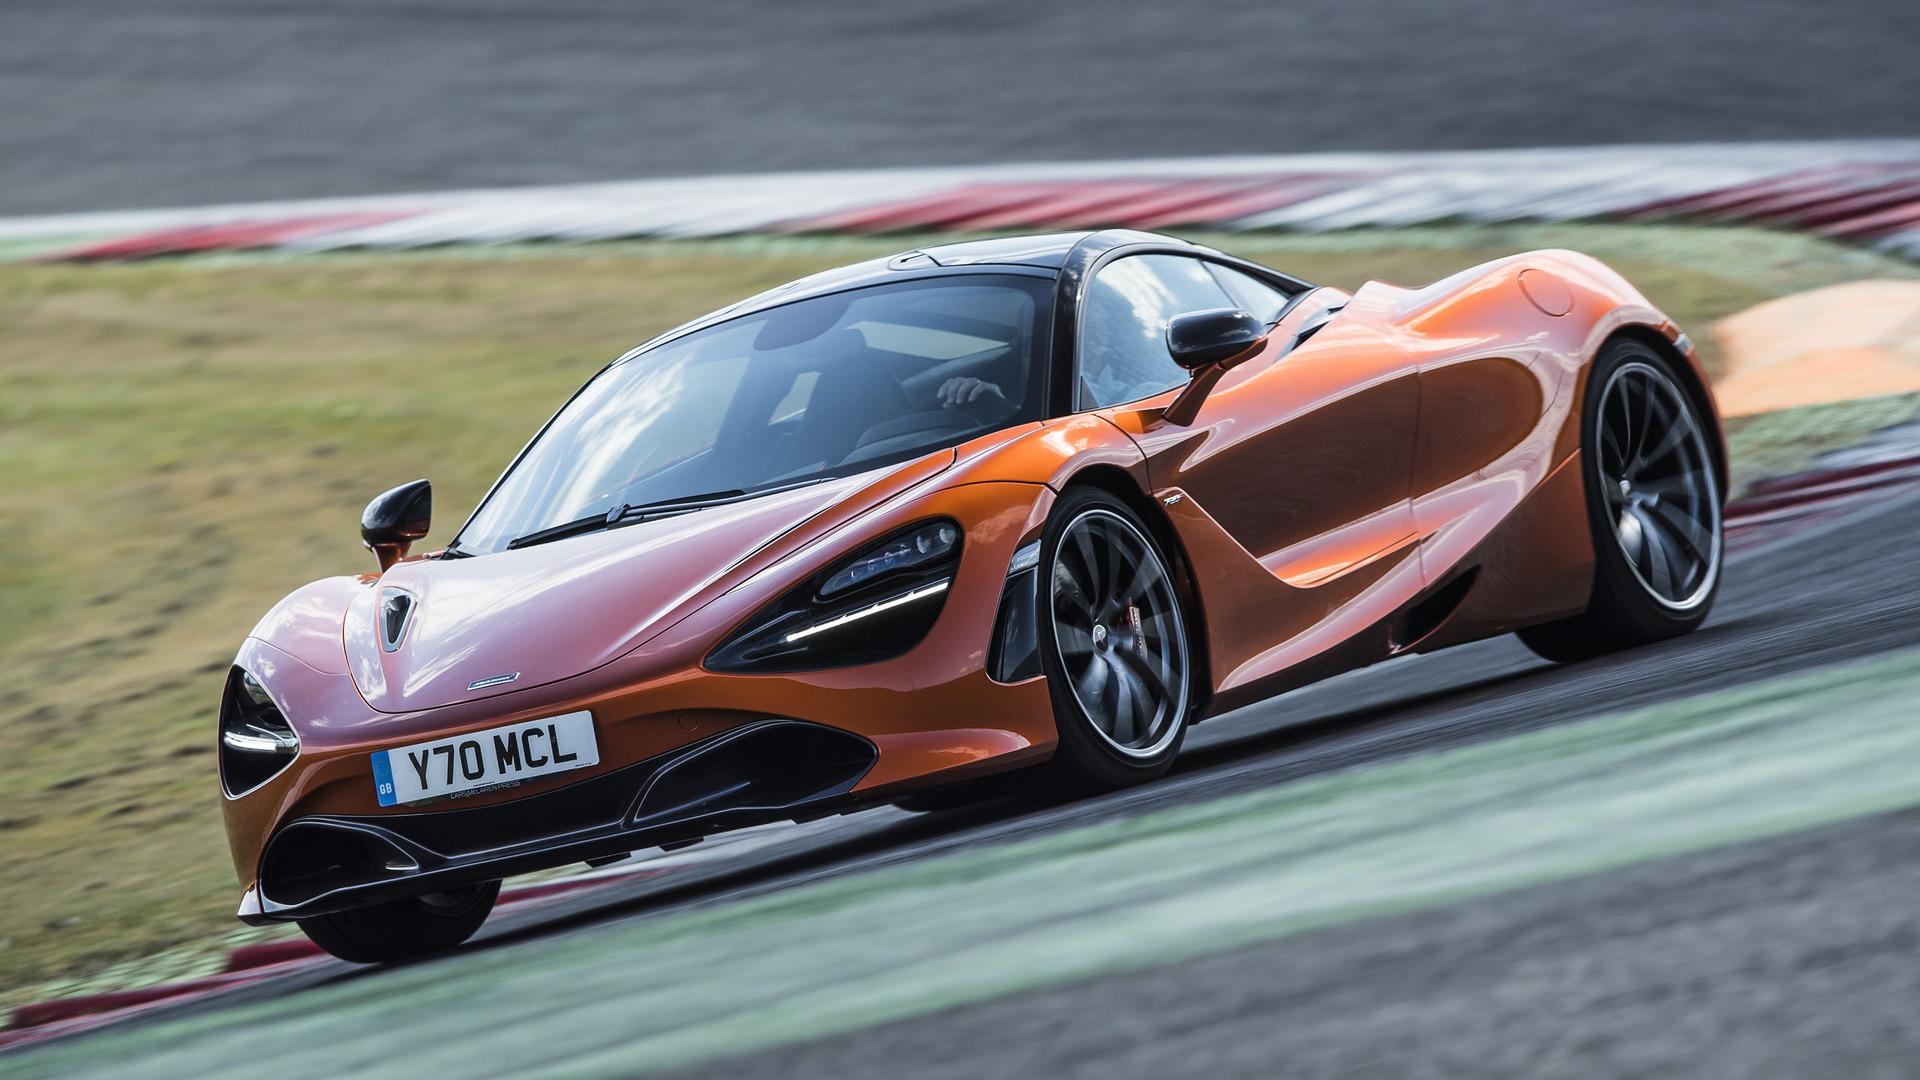 McLaren: Britanija da se fokusira na lagane automobile